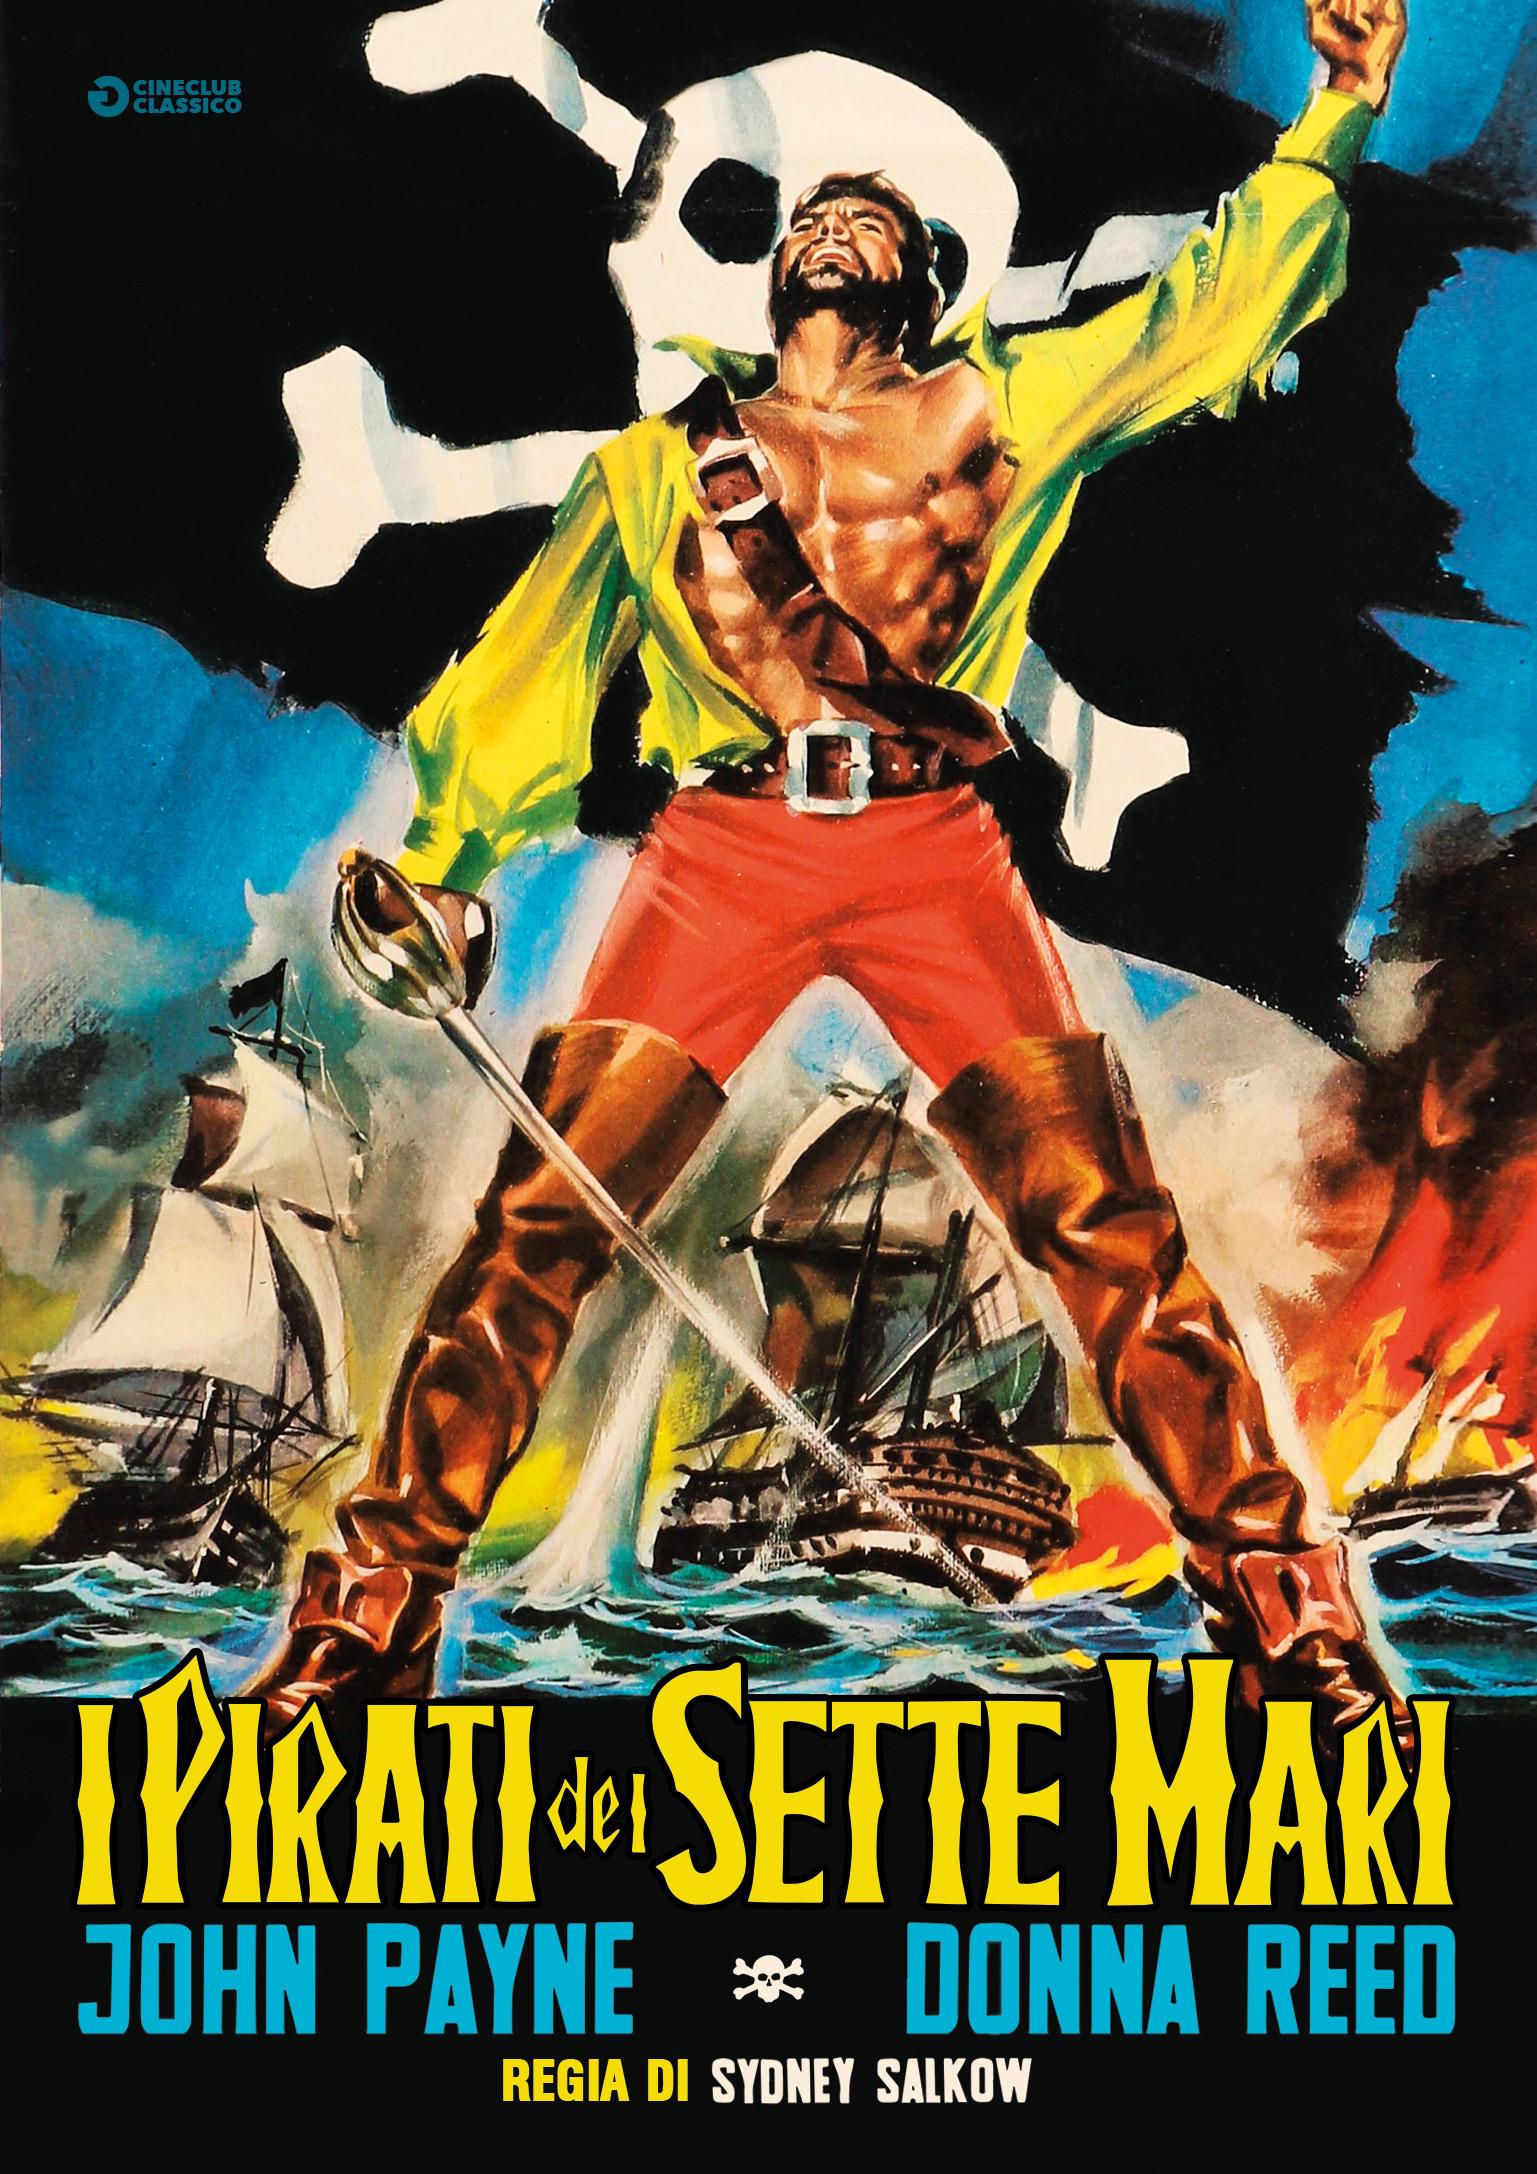 I PIRATI DEI SETTE MARI (DVD)